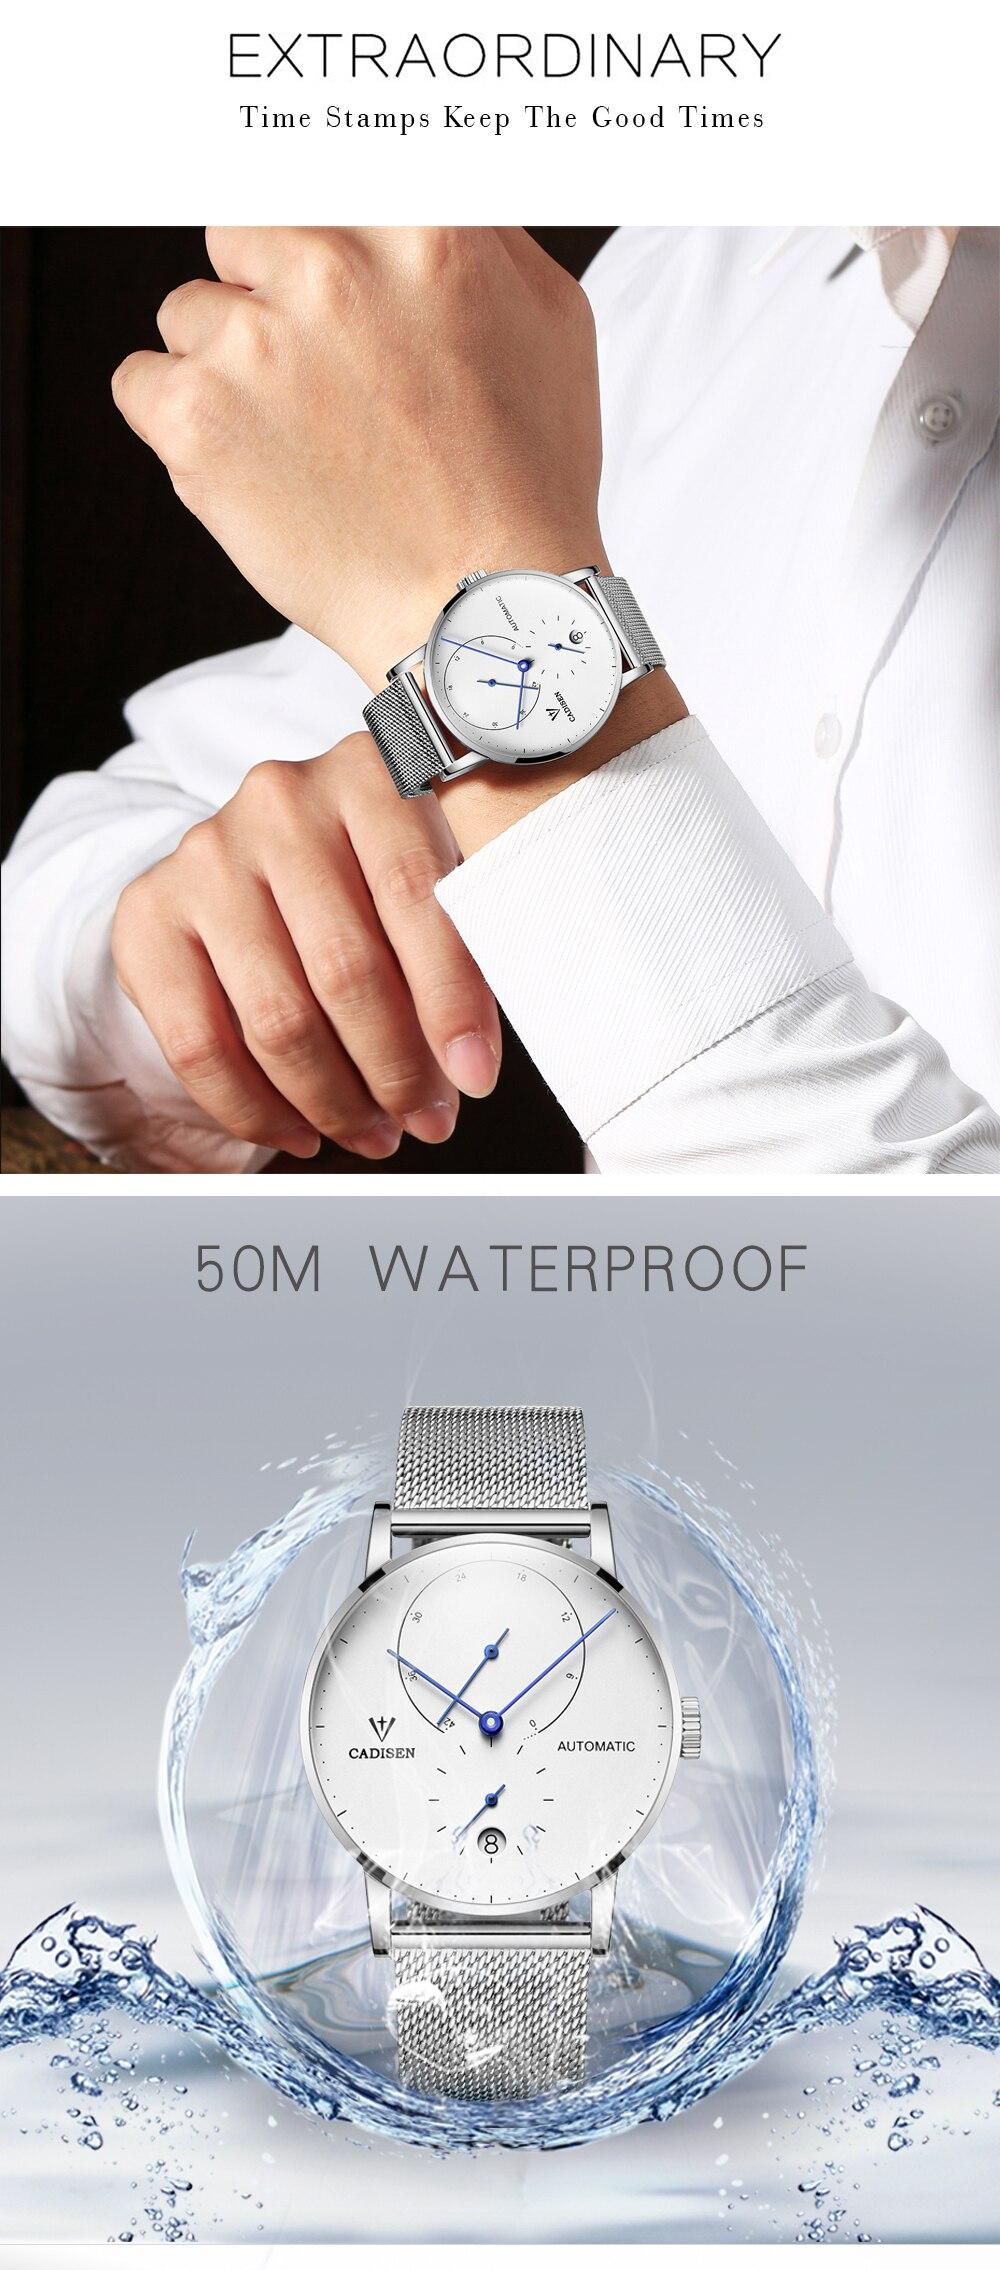 HTB1UrFJkVkoBKNjSZFkq6z4tFXaM CADISEN Top Mens Watches Top Brand Luxury Automatic Mechanical Watch Men Full Steel Business Waterproof Fashion Sport Watches